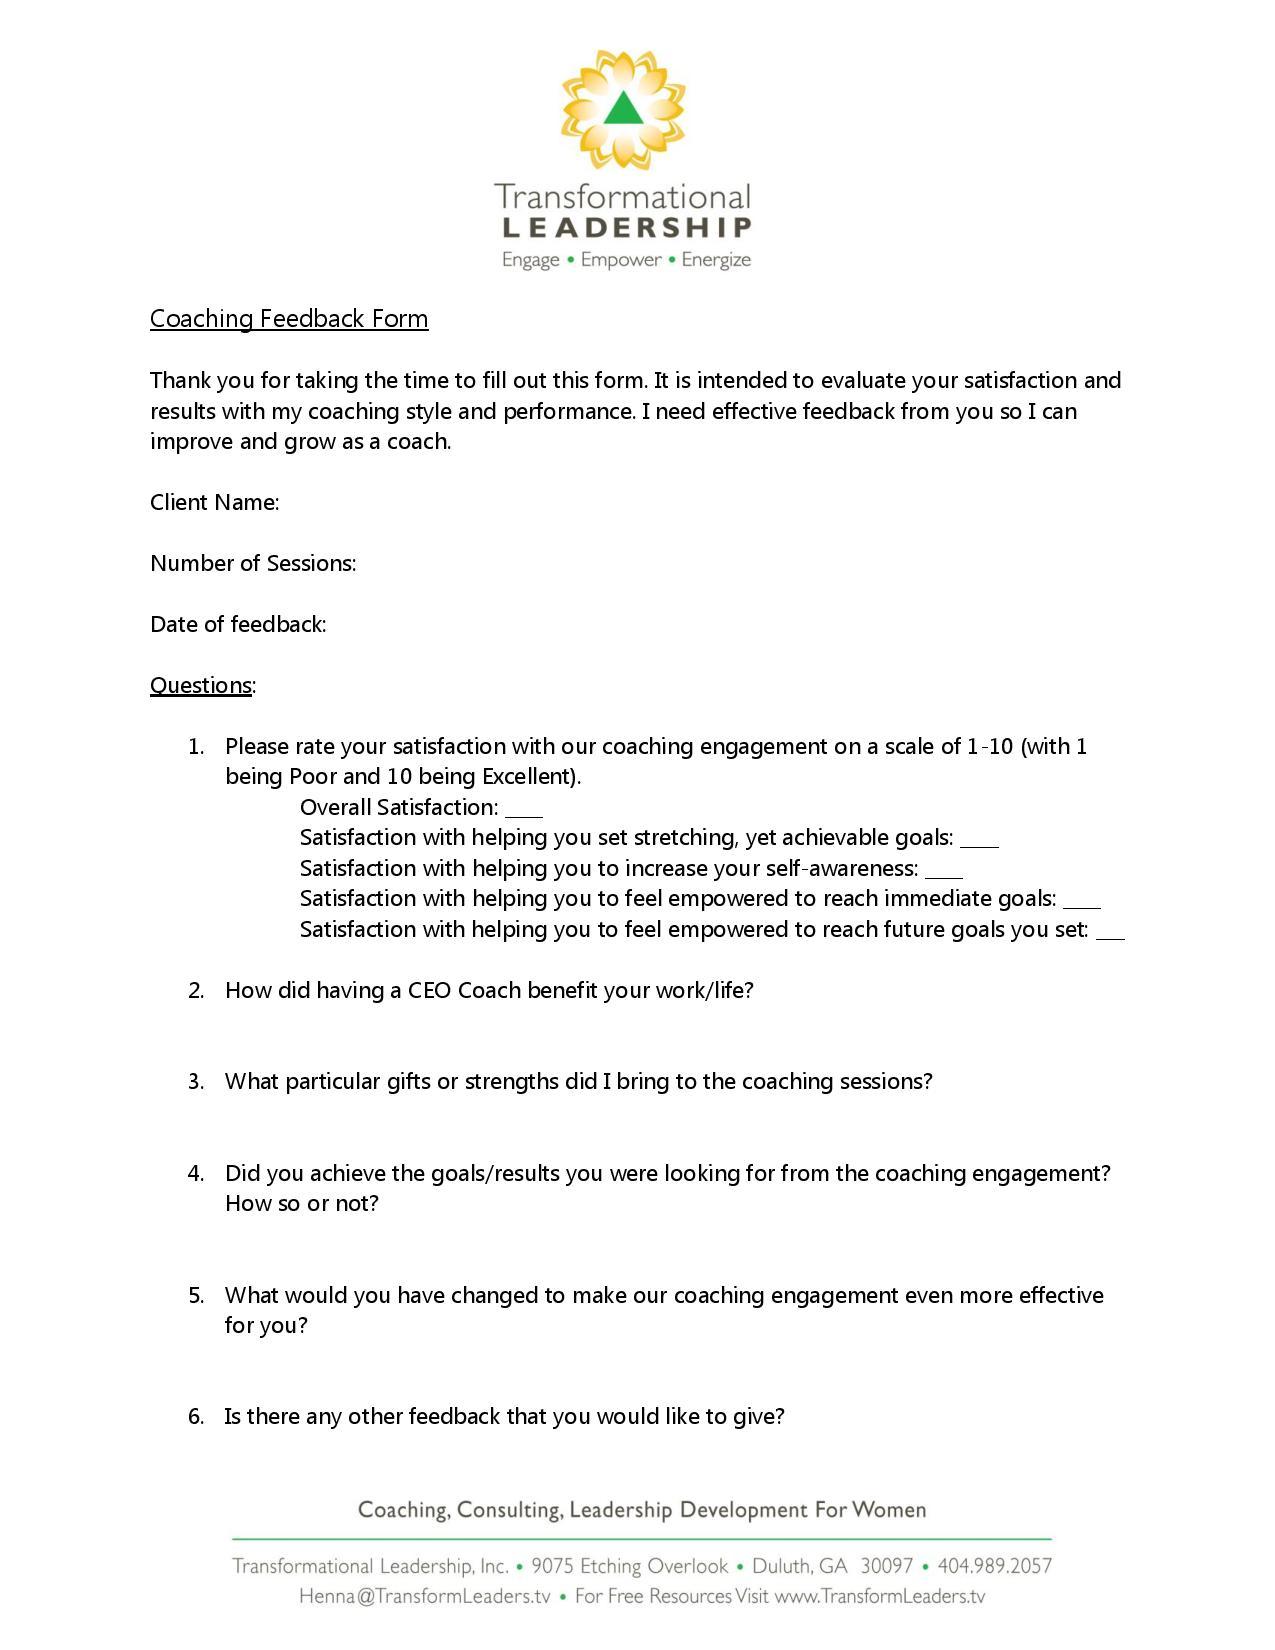 transformational leadership coaching feedback form page 001